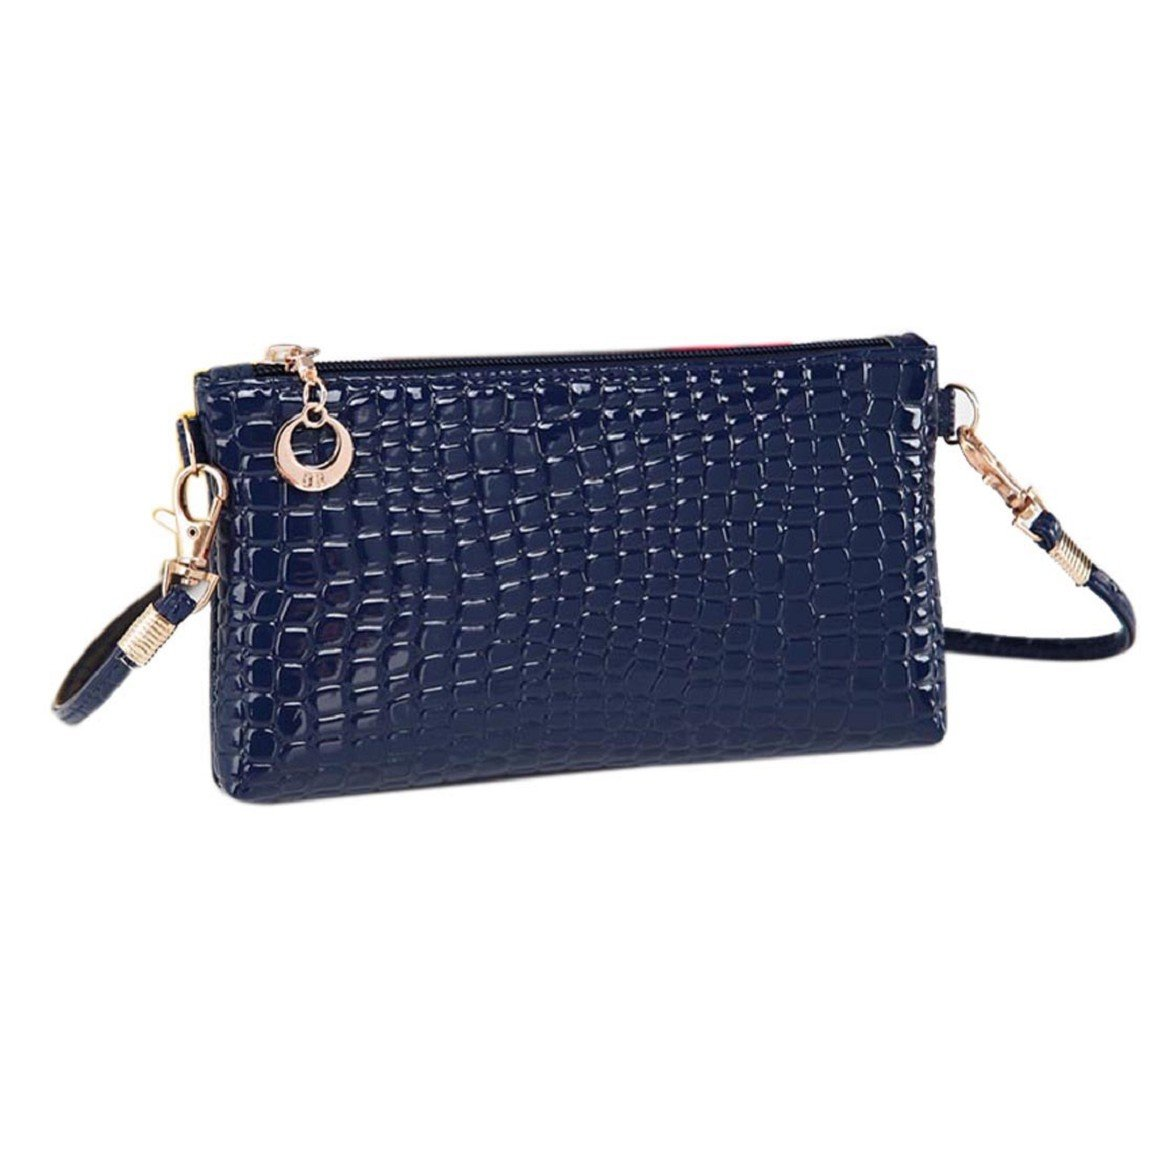 Willtoo(TM) Women Crocodile Leather Clutch Messenger Crossbody Shoulder Handbag(Blue)